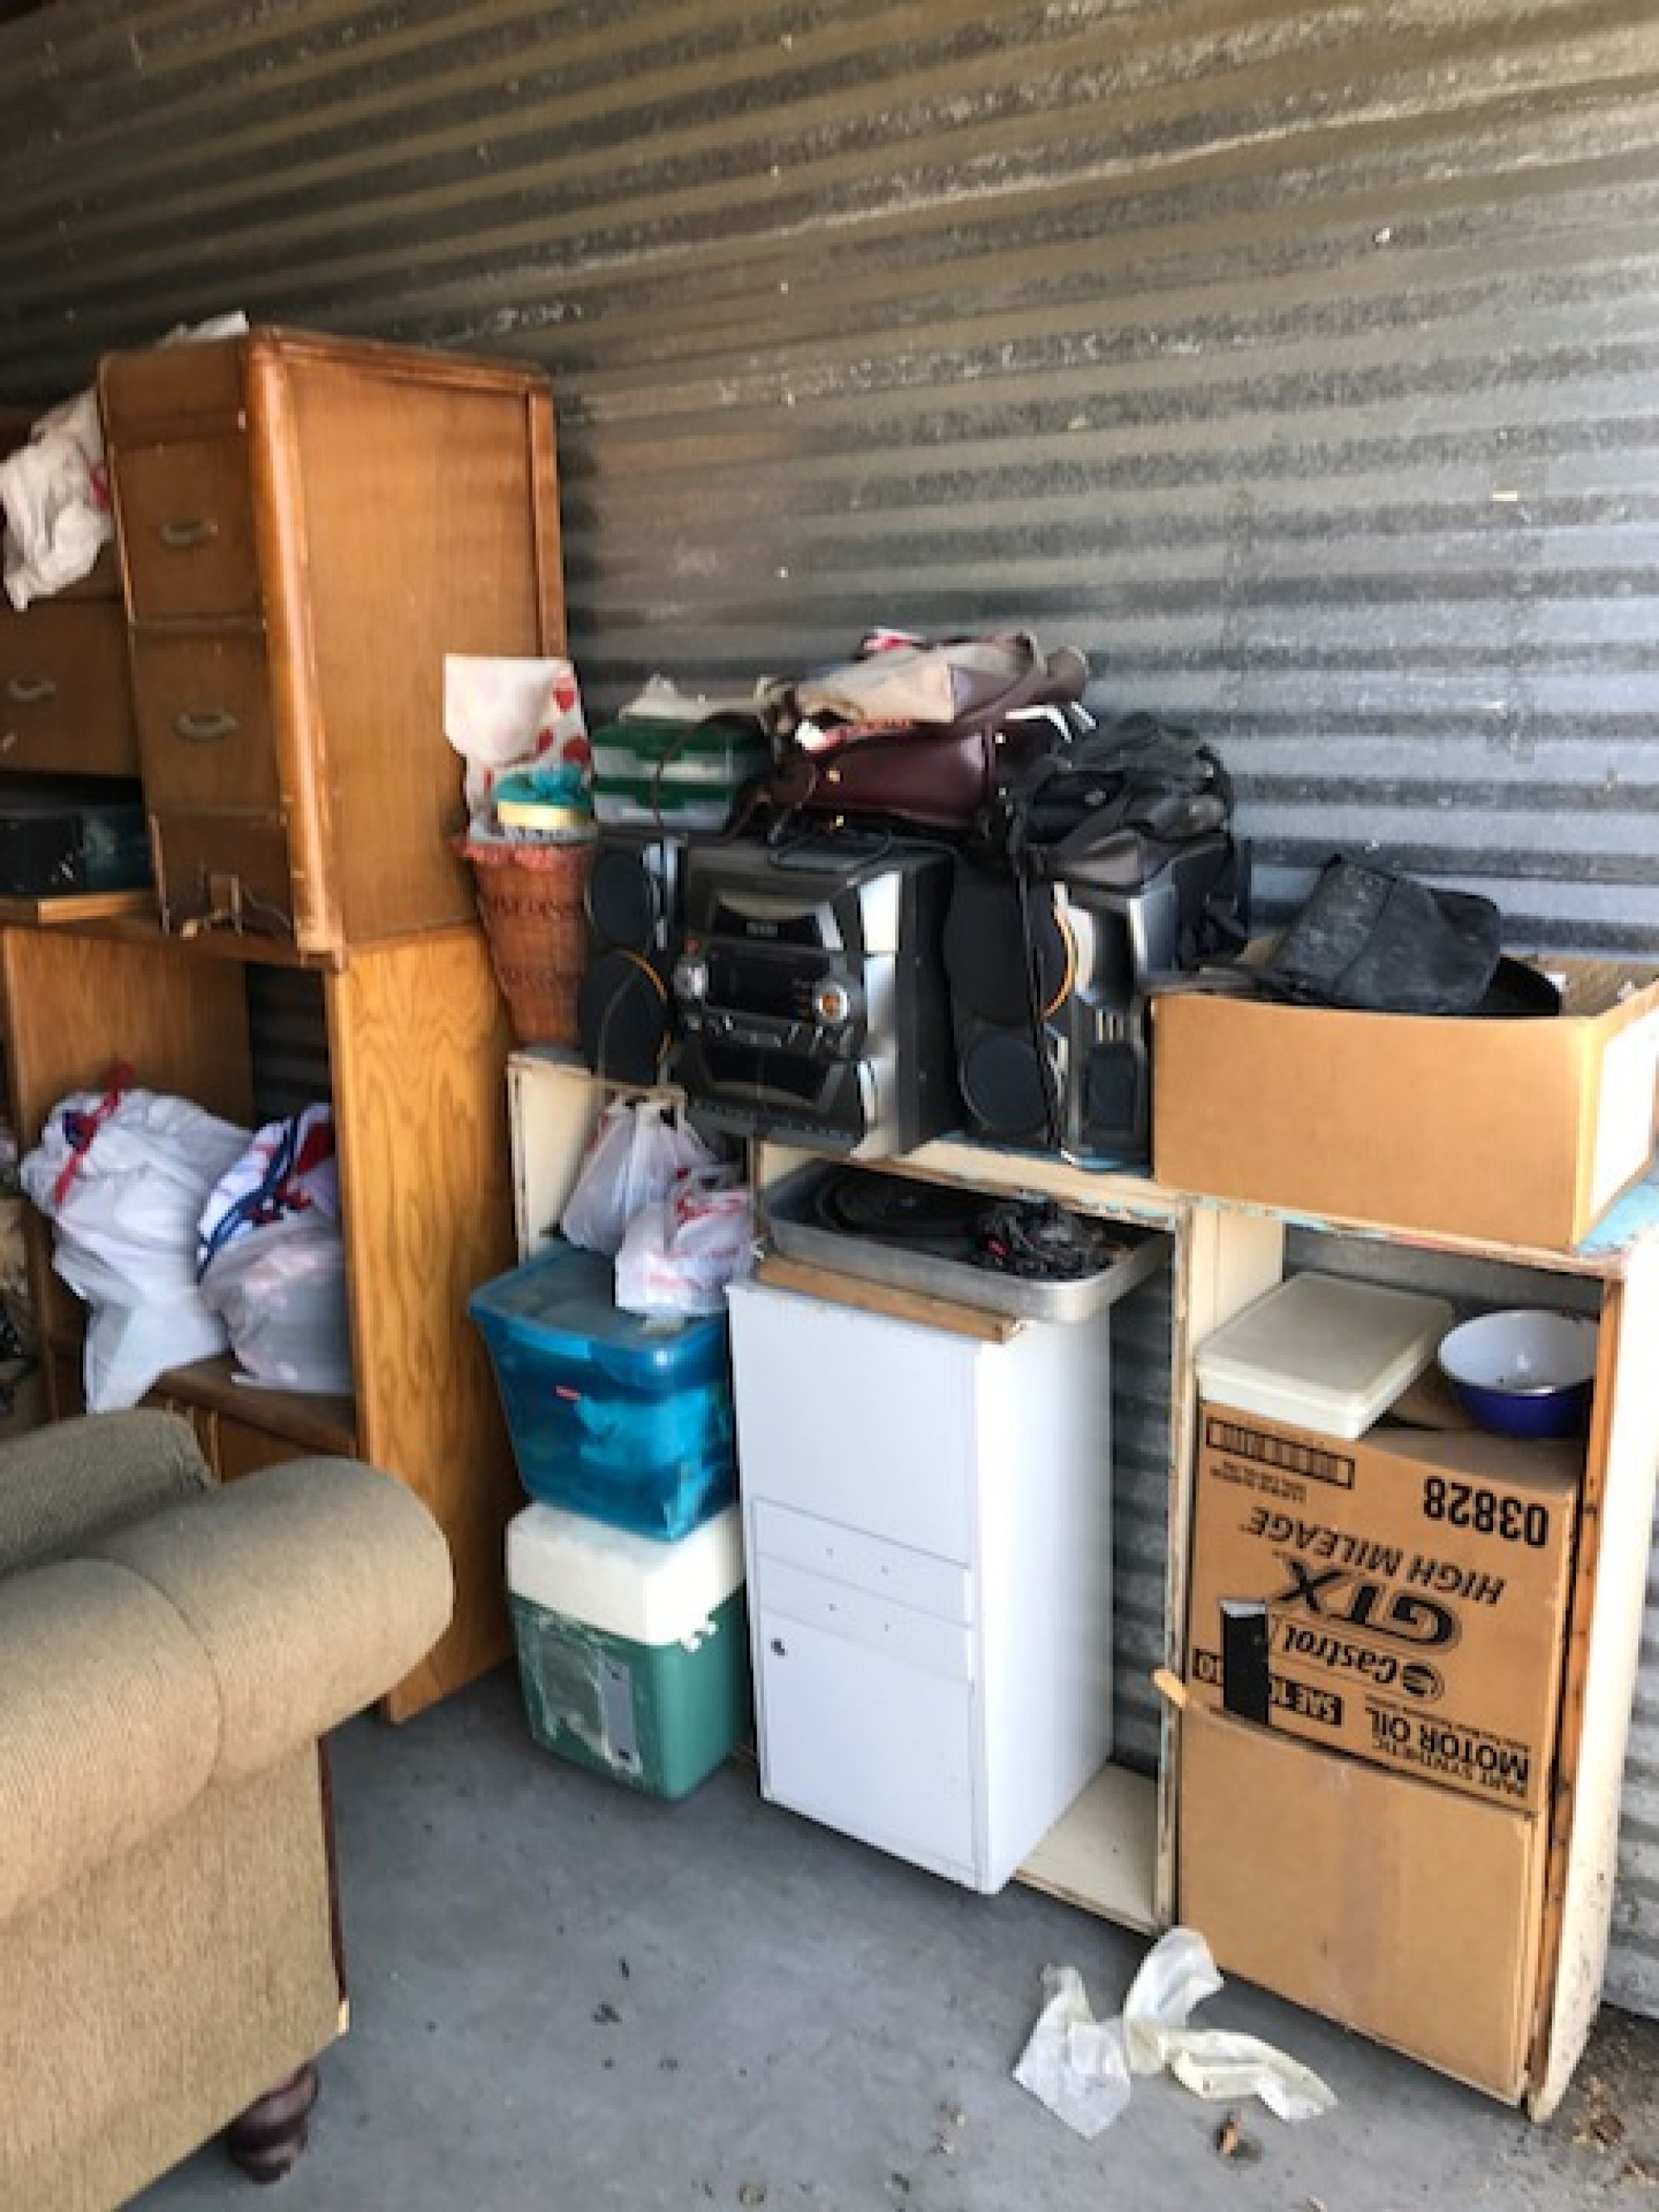 CLICK THUMBNAIL TO VIEW. Vacaville CA & Storage Unit Auction: 544557 | Vacaville CA | StorageTreasures.com